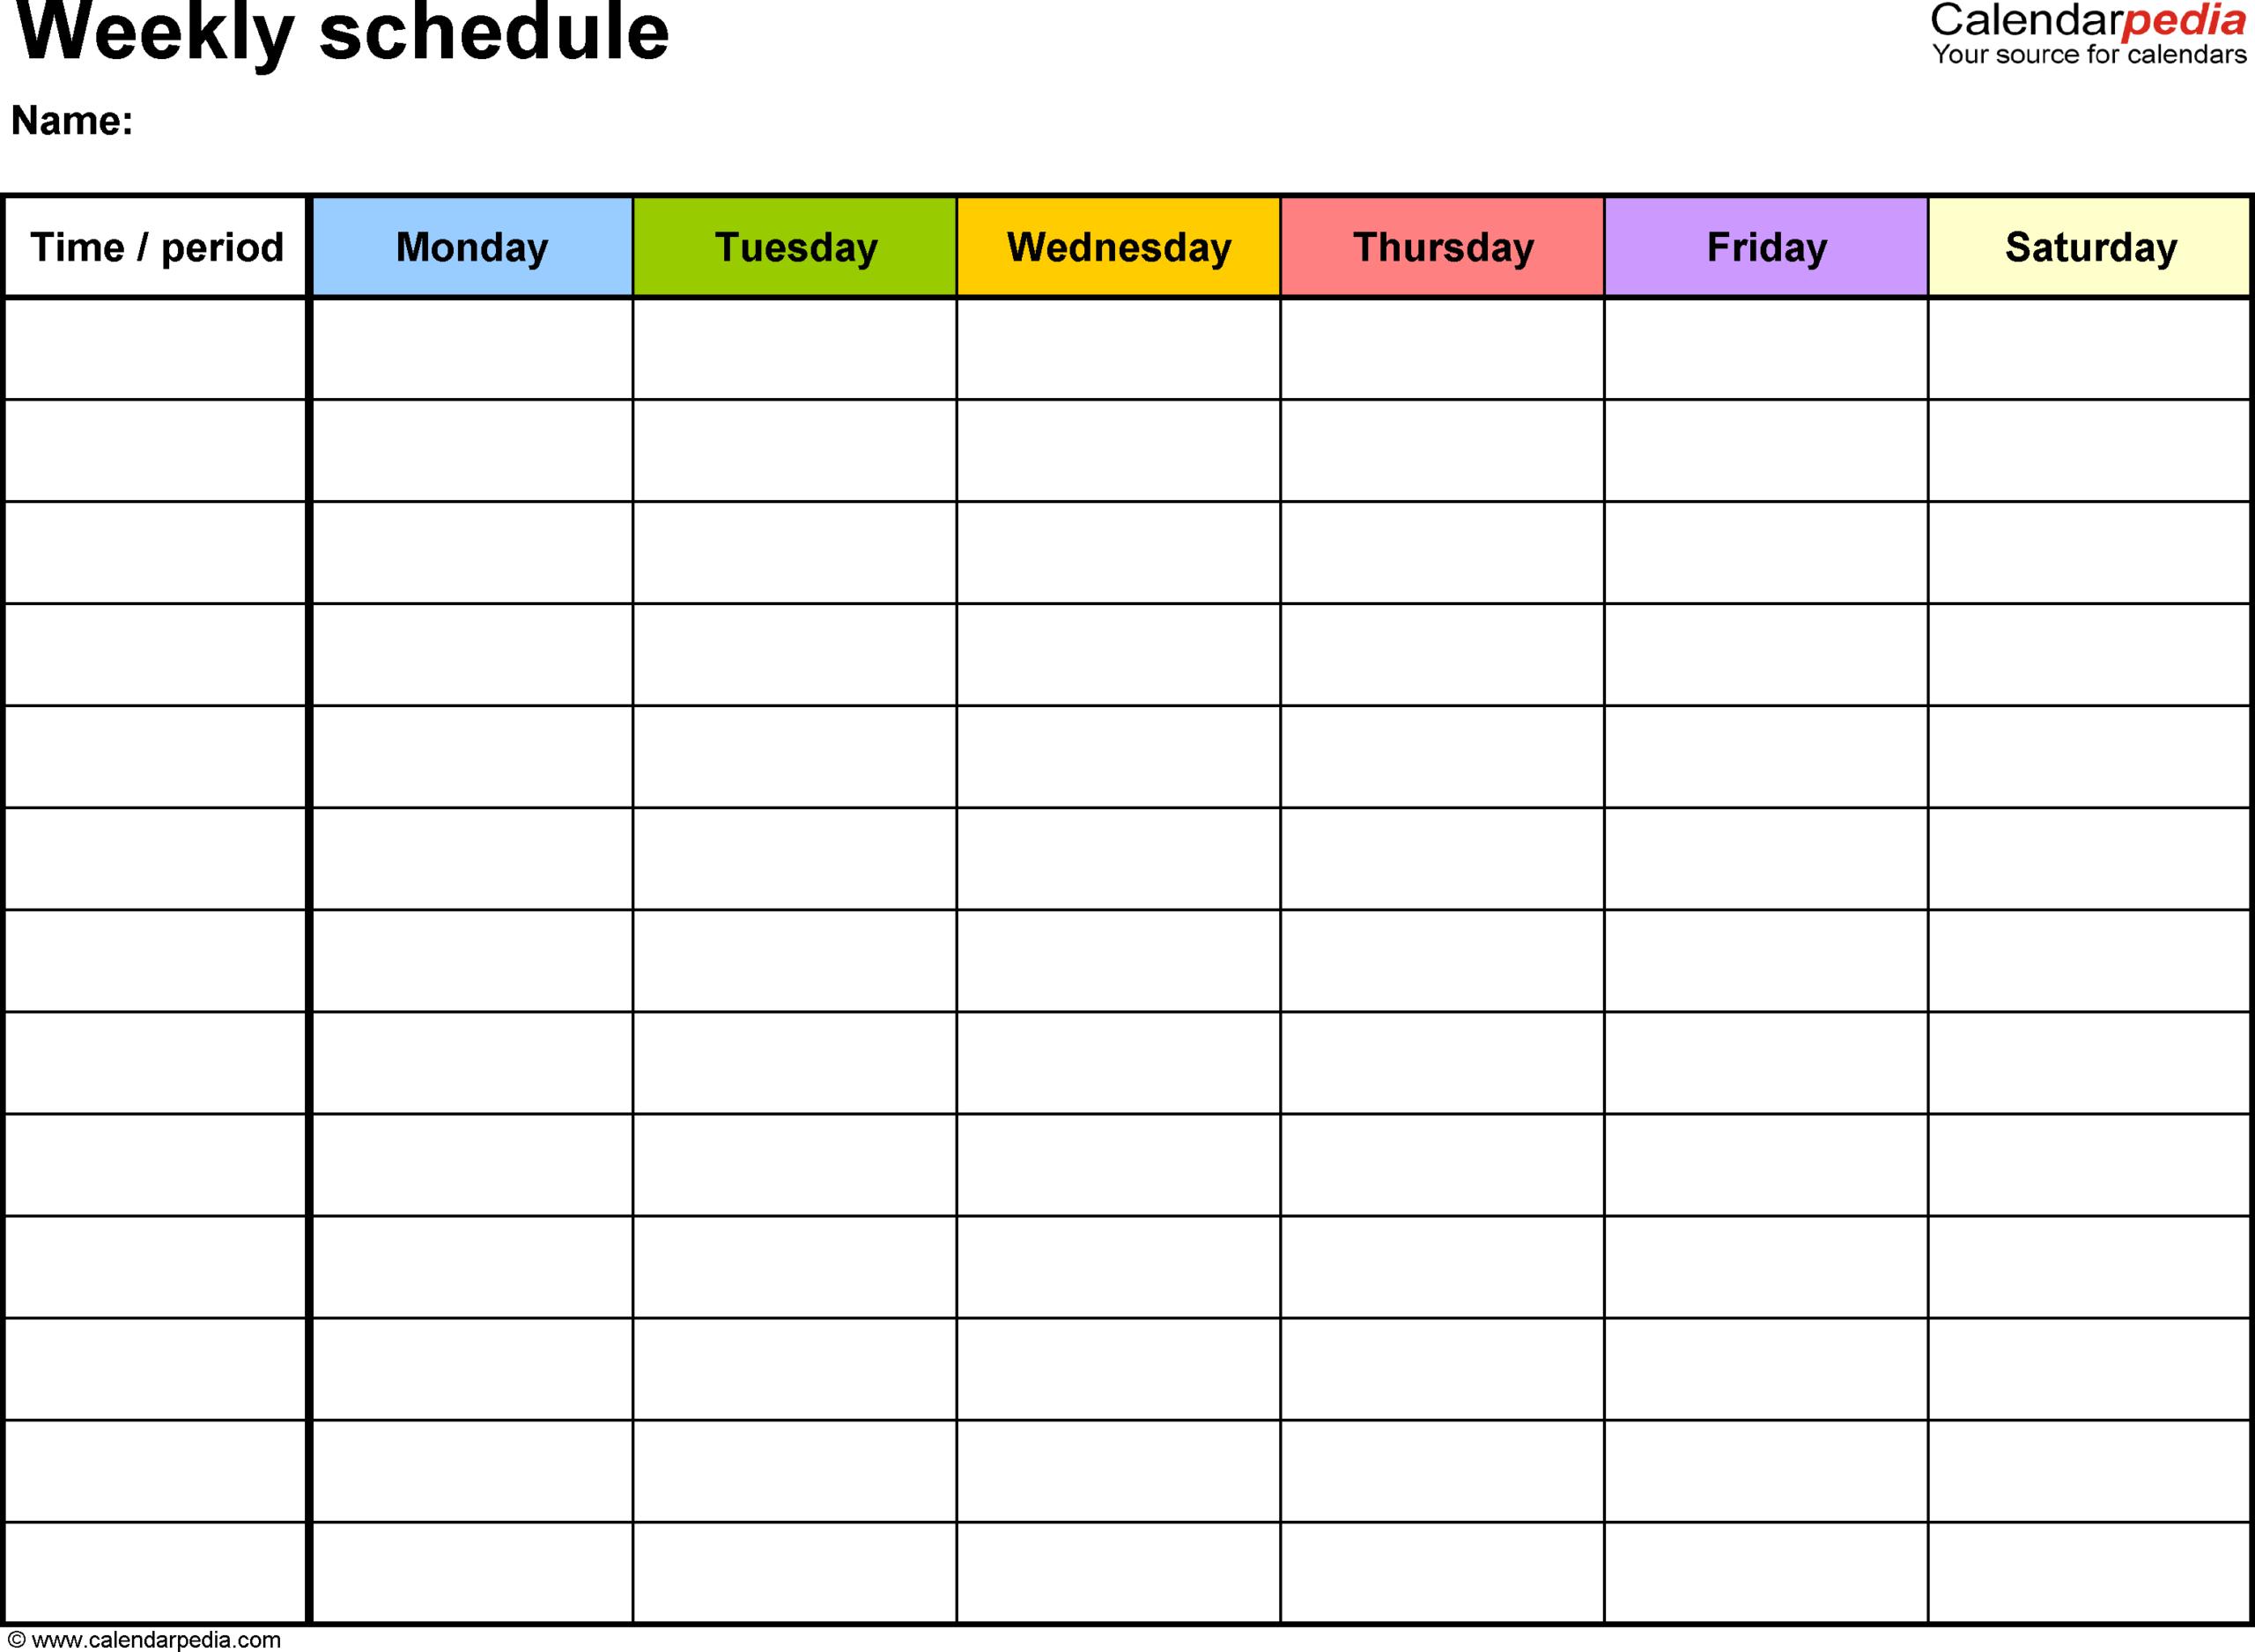 Blank Calendar To Fill In | Calendar Printable Free with regard to Fill In The Blank Calendar